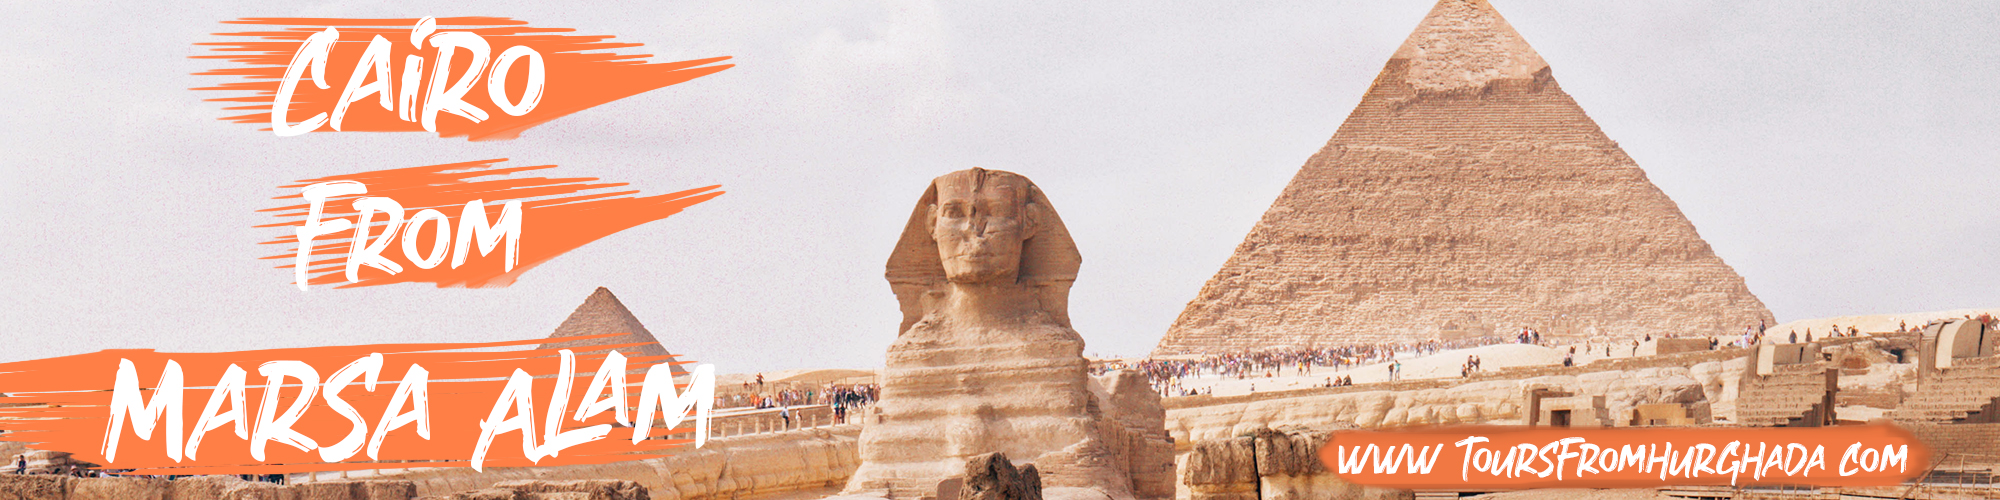 Trips to Cairo from Marsa Alam ToursFromHurghada